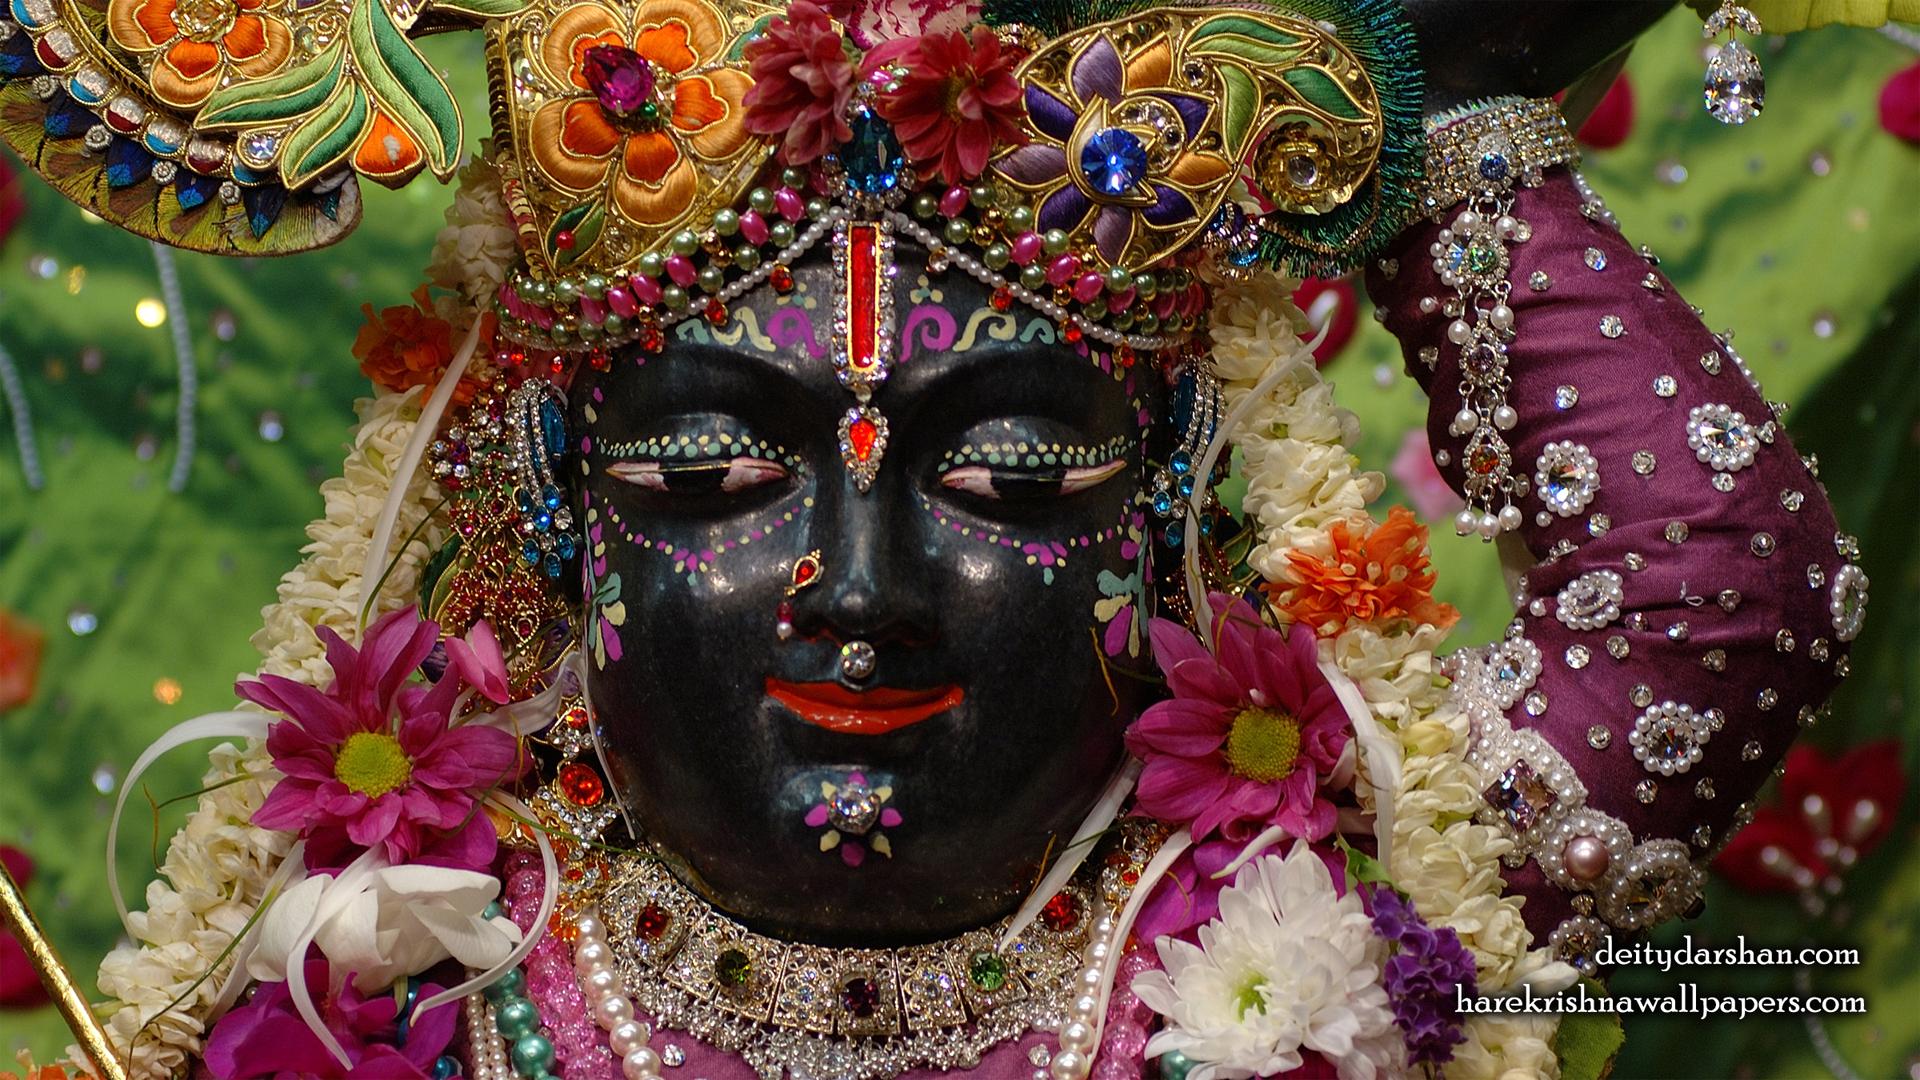 Sri Gopal Close up Wallpaper (047) Size 1920x1080 Download